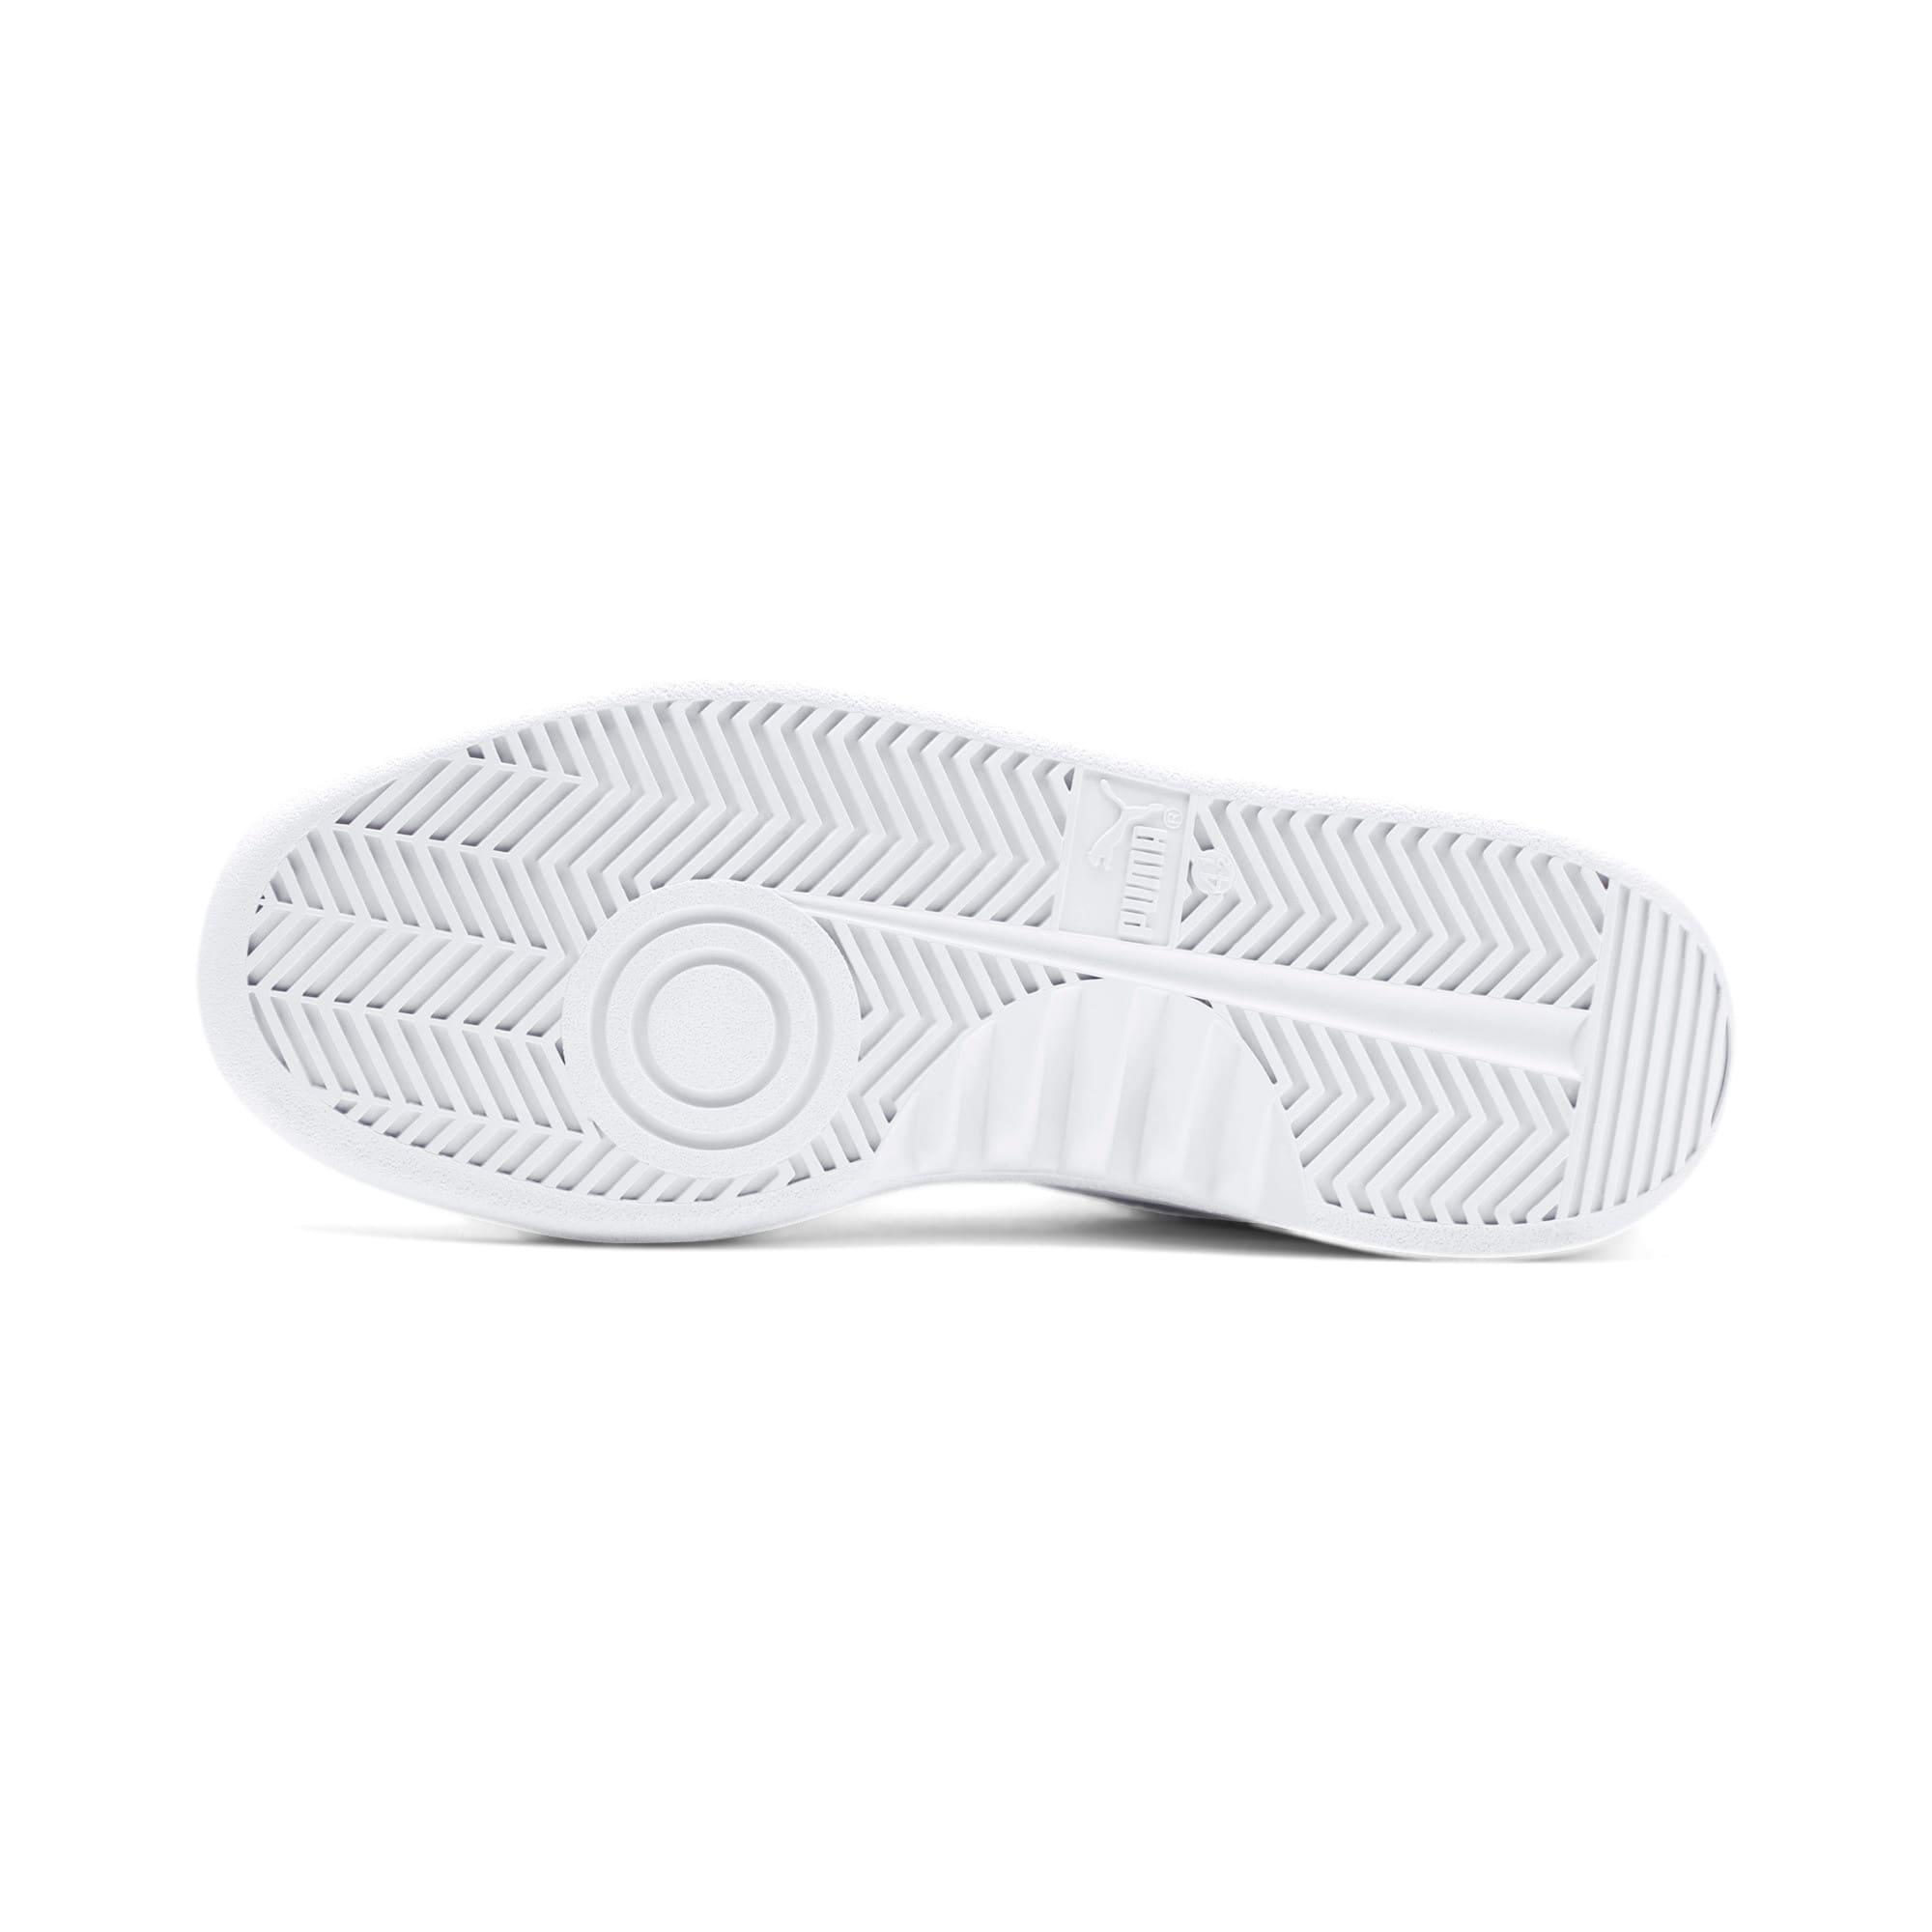 Thumbnail 5 of California Monochrome Women's Sneakers, Puma White-Puma Silver, medium